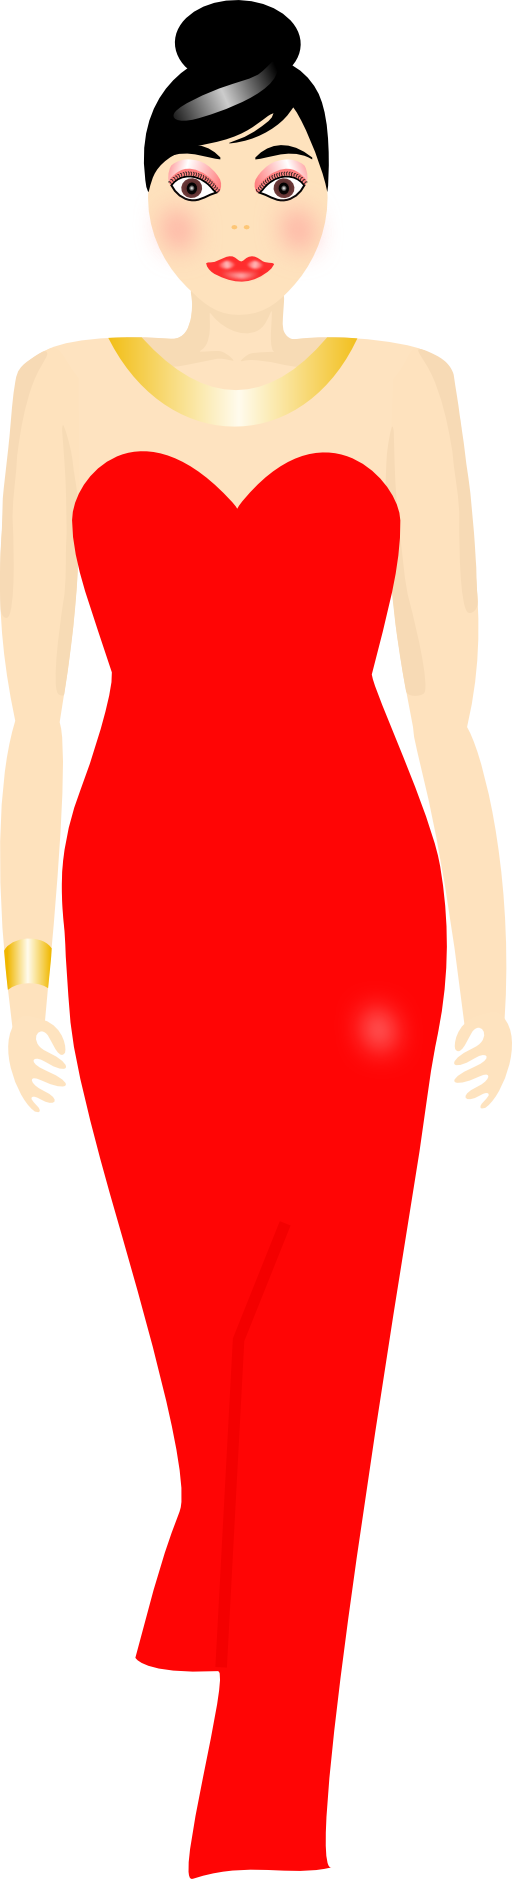 Red clipart human. Dress panda free images